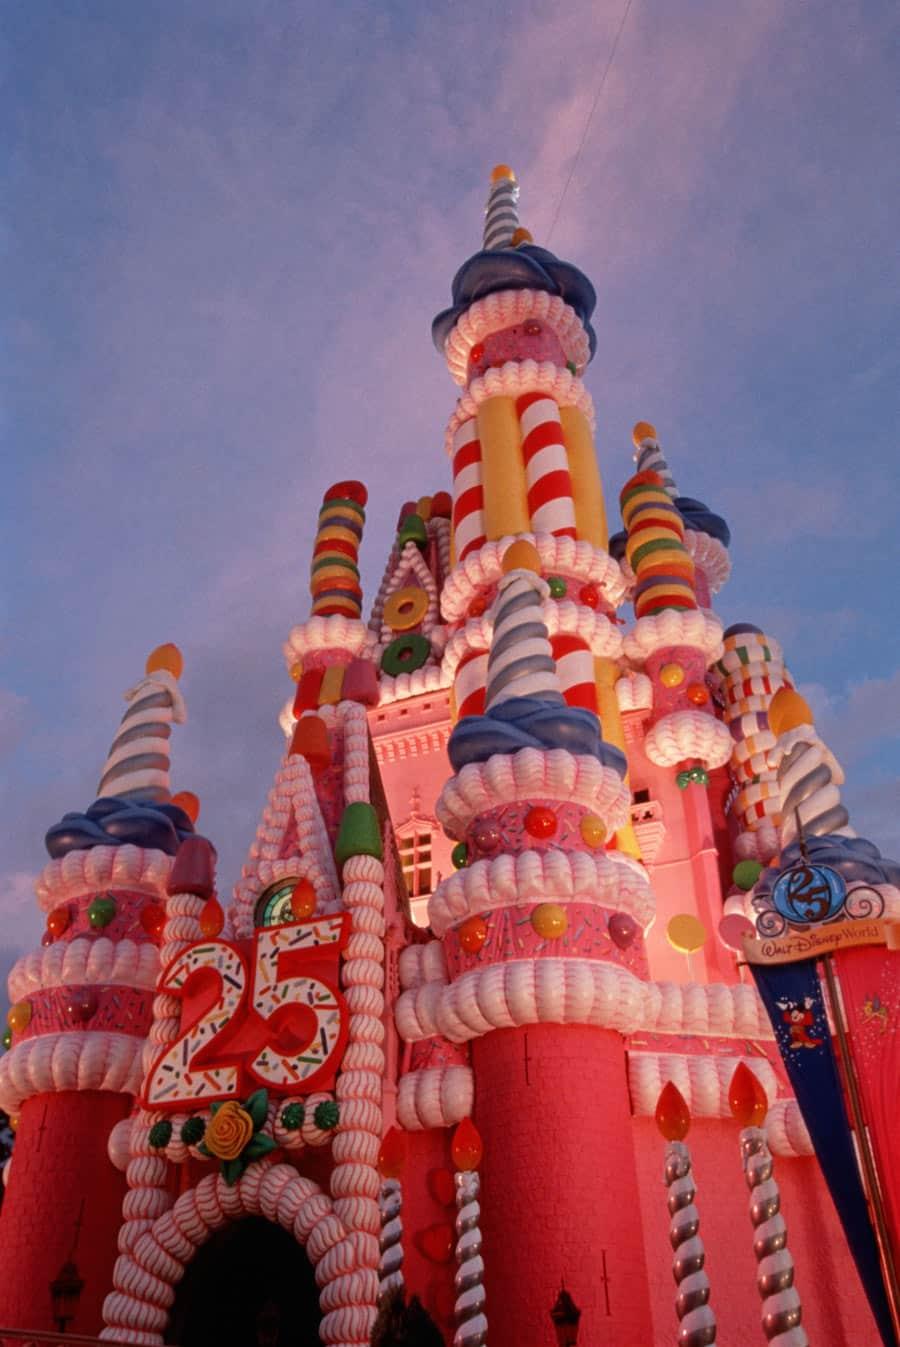 disney 25th anniversary castle cake